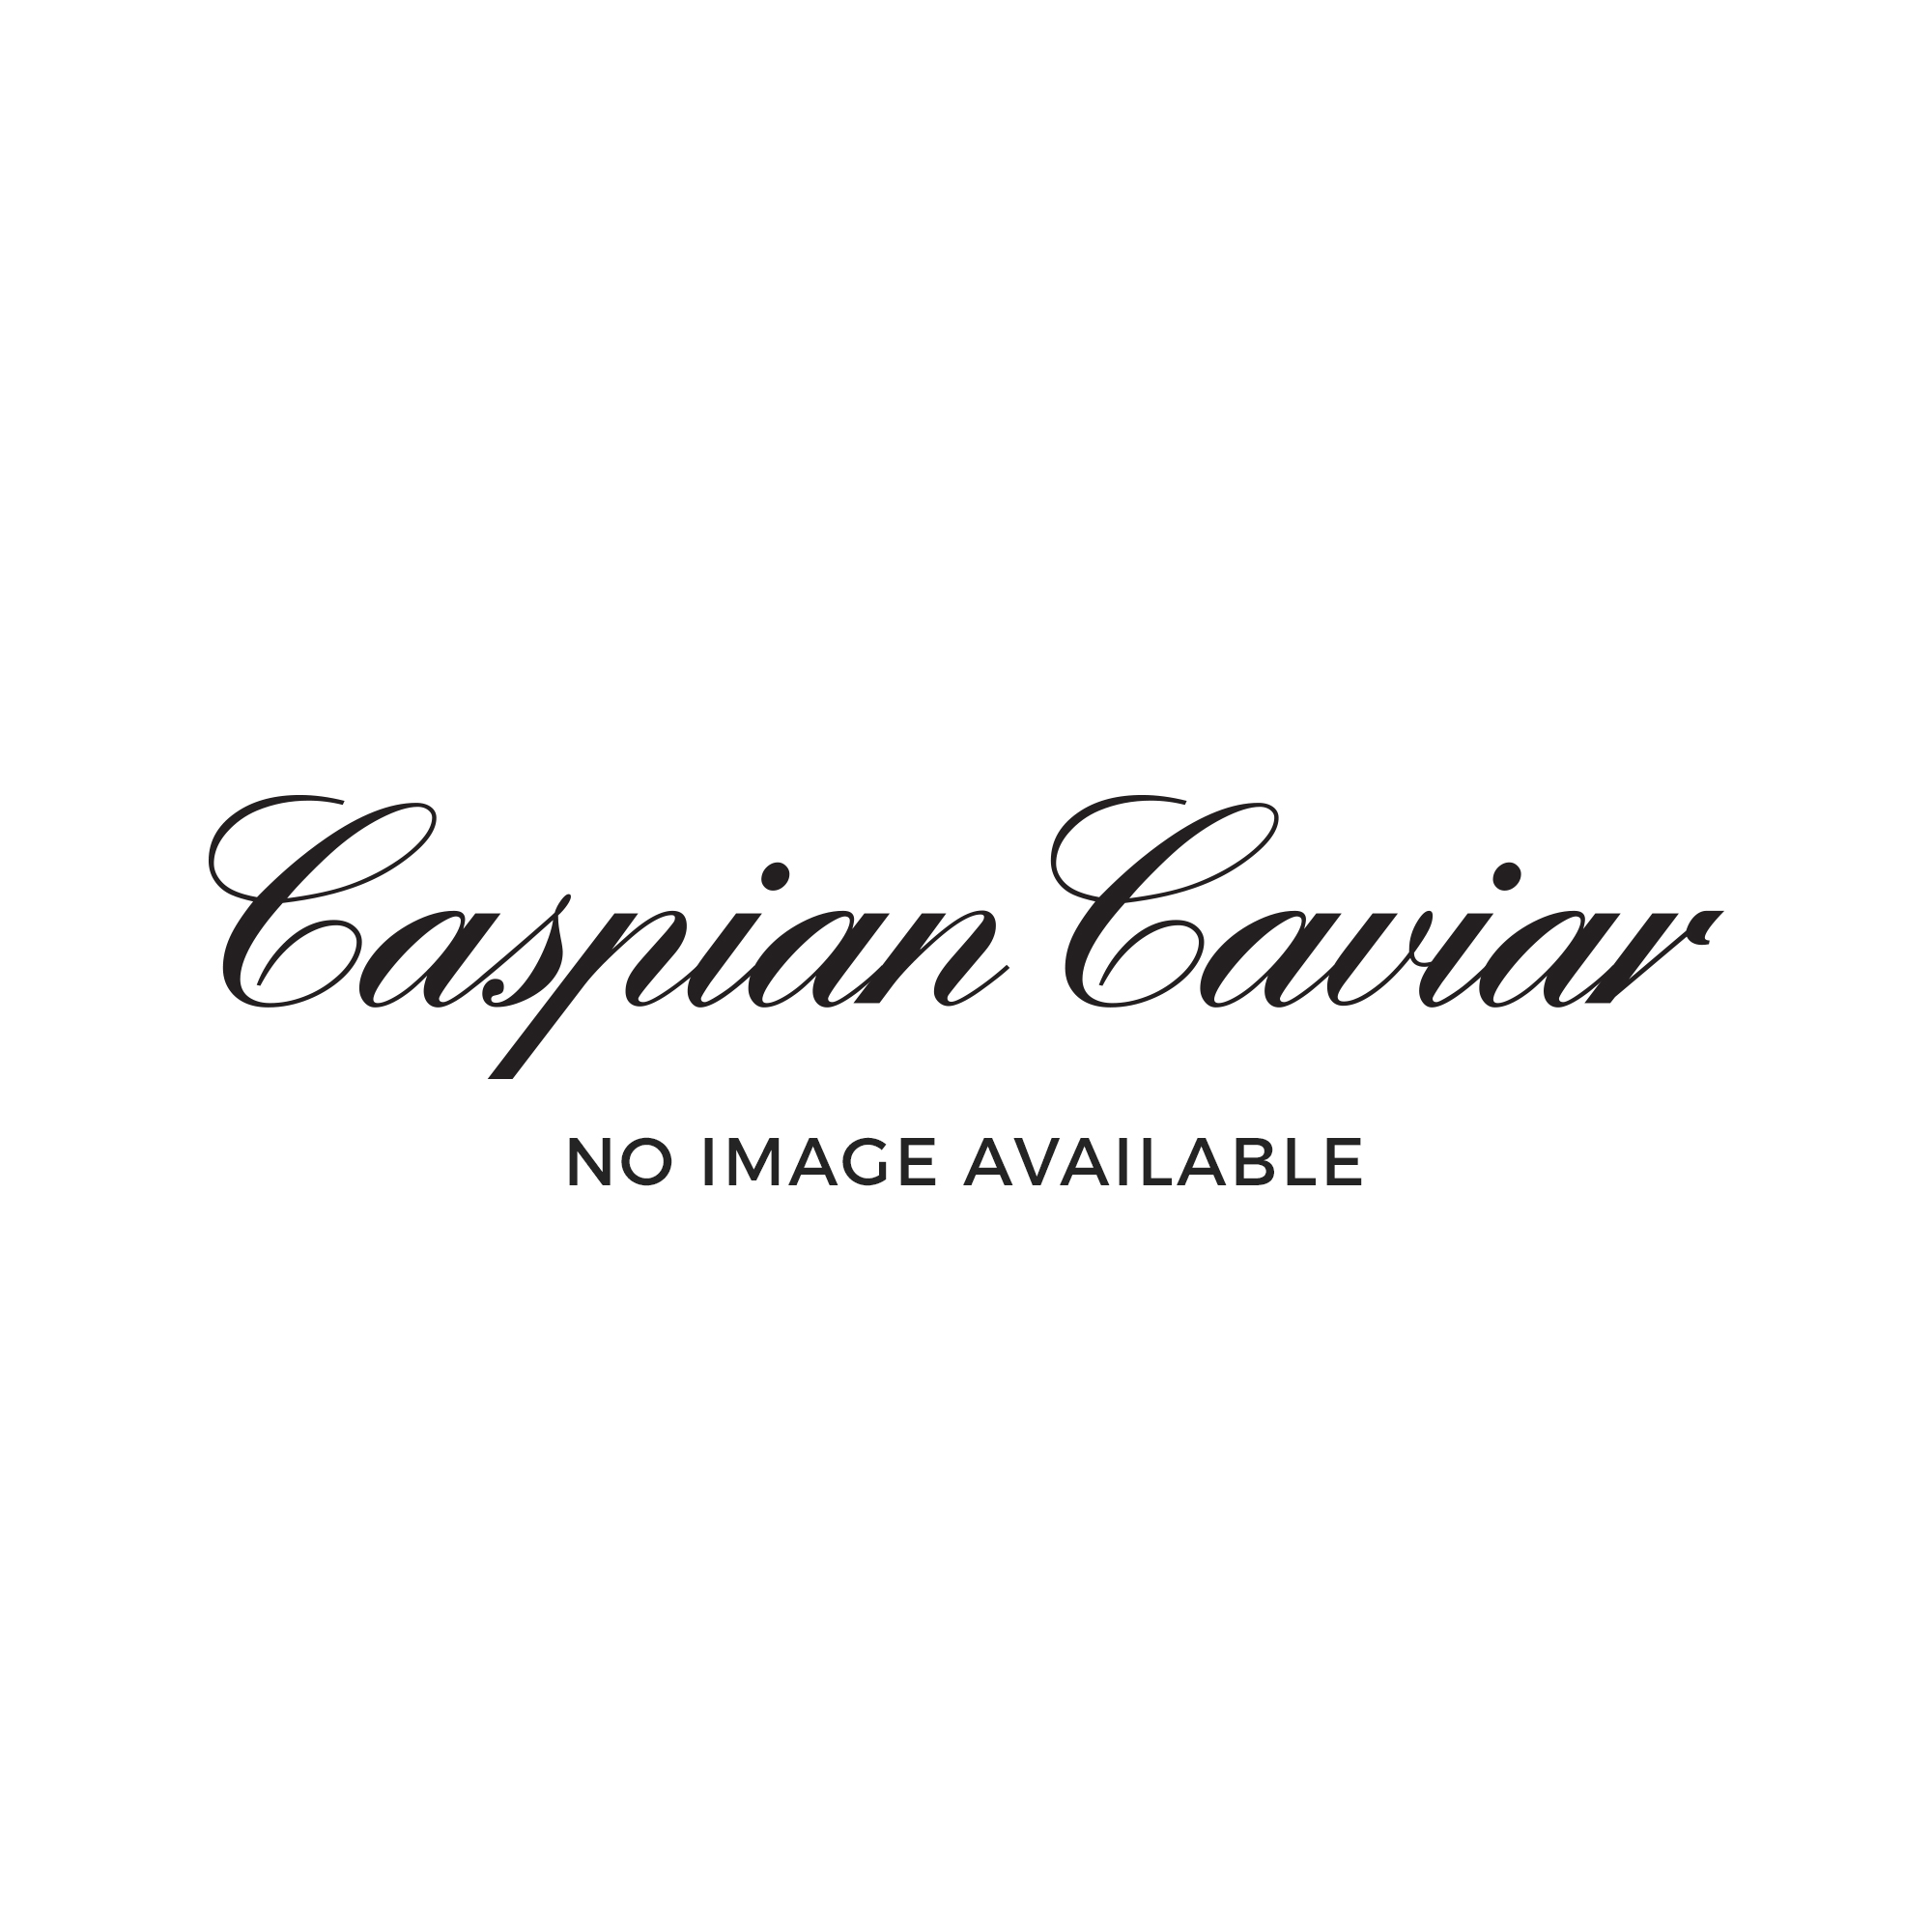 Caspian Caviar Fantastic Hamper